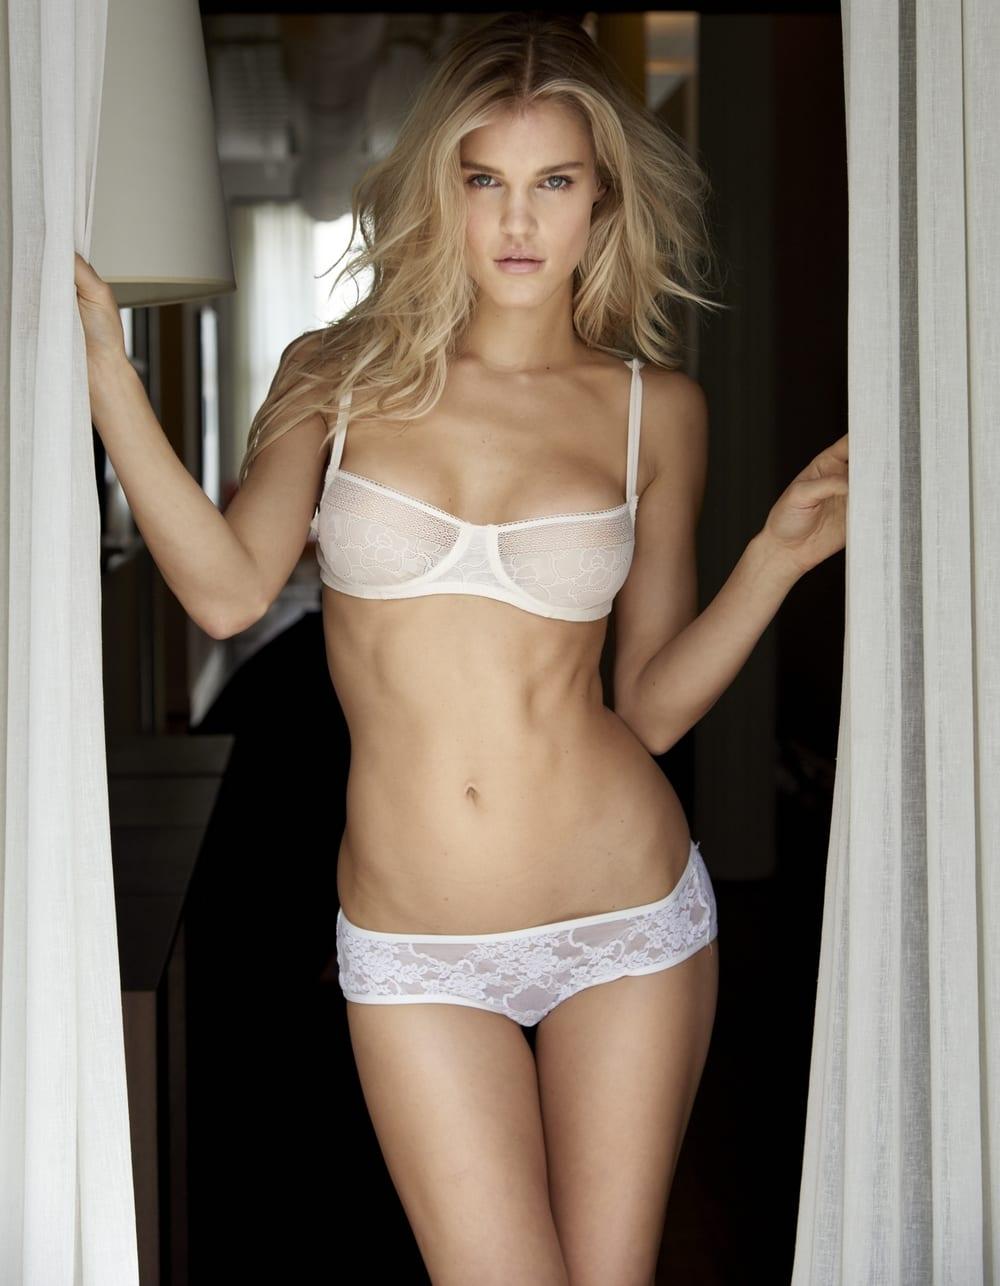 Images Joy Corrigan nude (85 foto and video), Sexy, Cleavage, Twitter, panties 2017